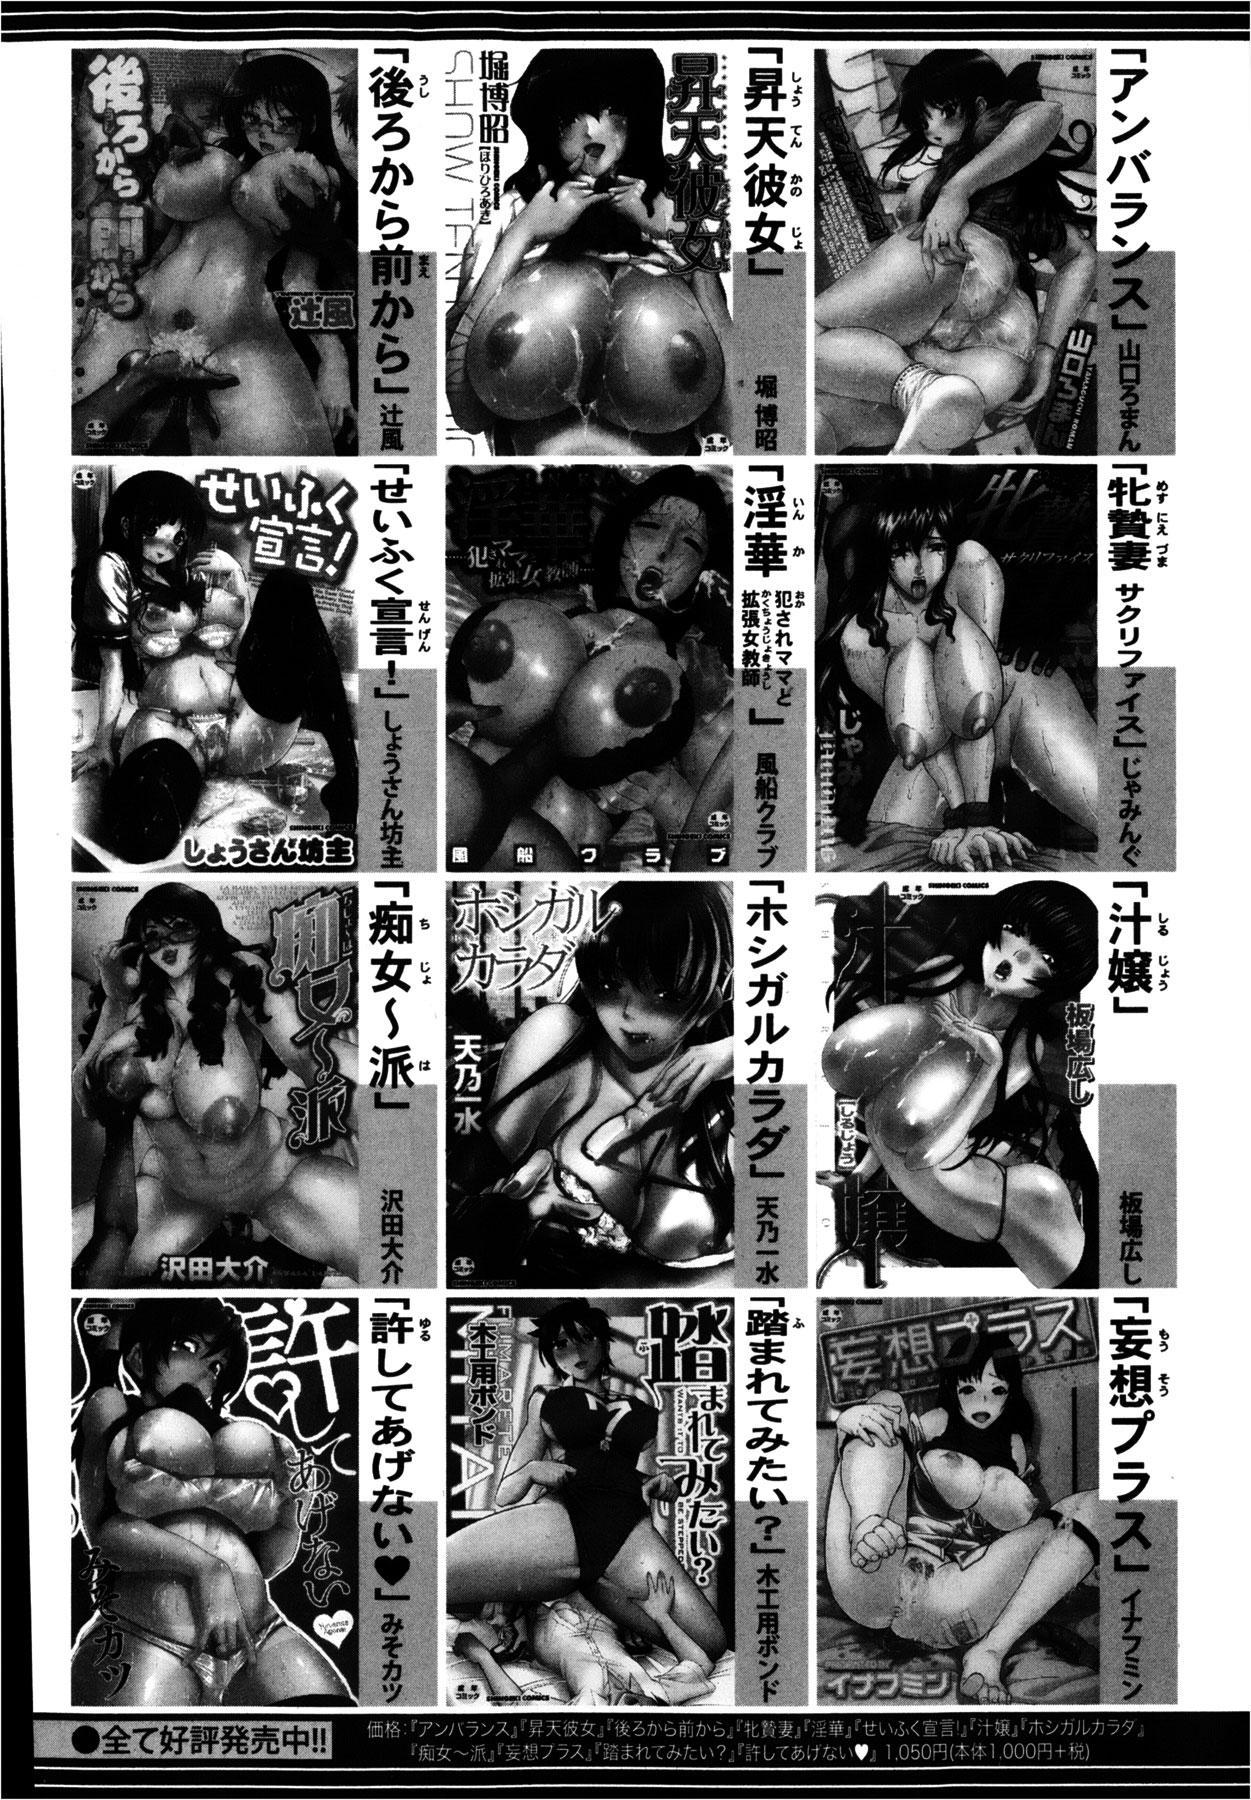 COMIC Shingeki 2013-02 369